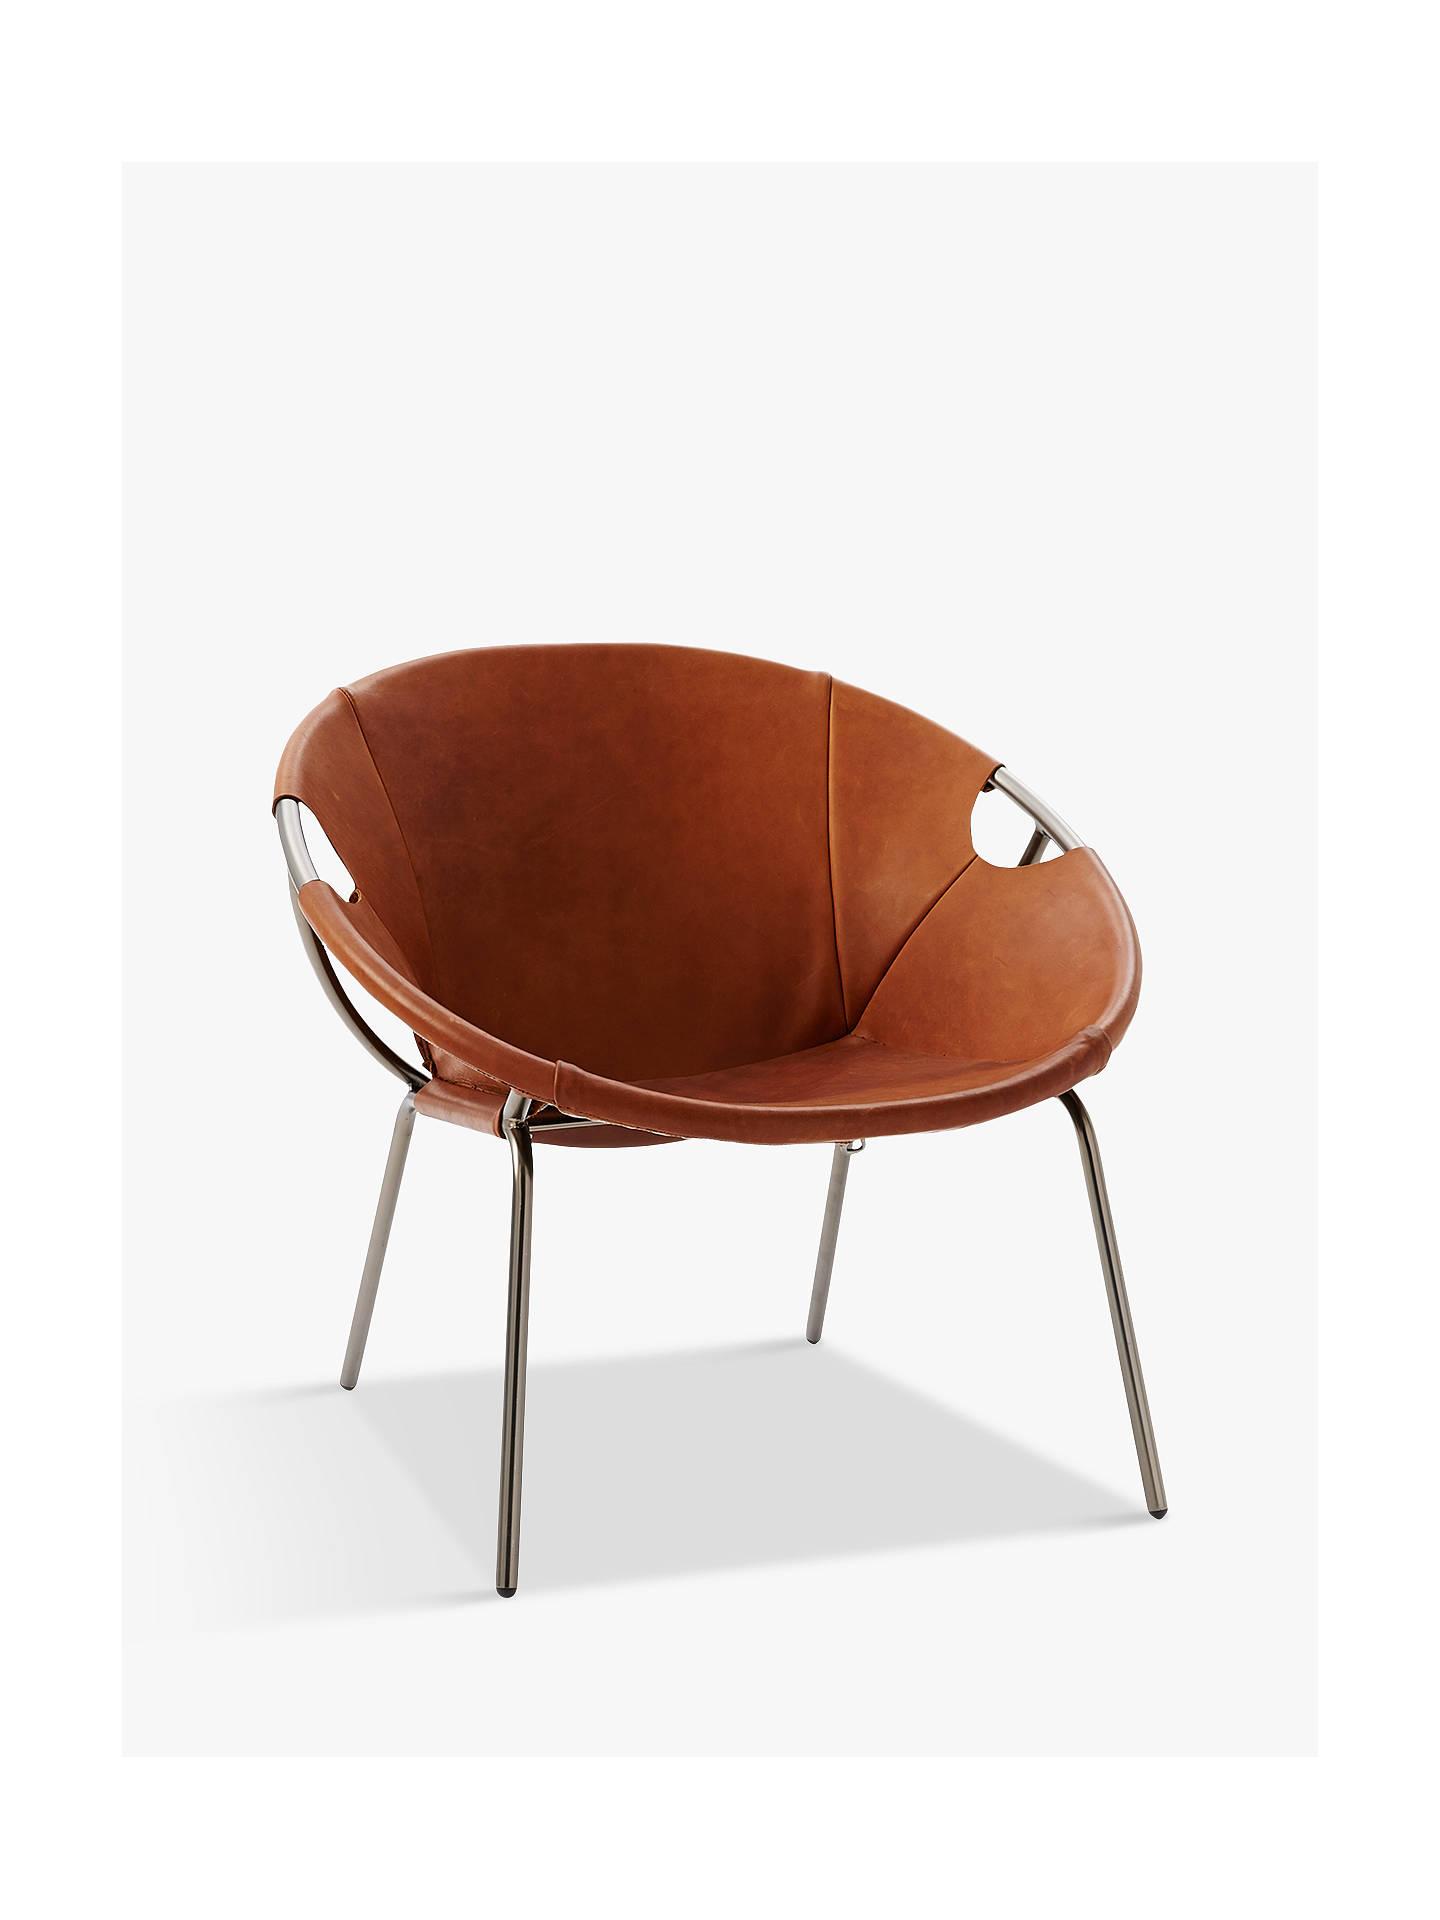 Awe Inspiring West Elm Dries Sling Leather Armchair Nutmeg At John Lewis Spiritservingveterans Wood Chair Design Ideas Spiritservingveteransorg